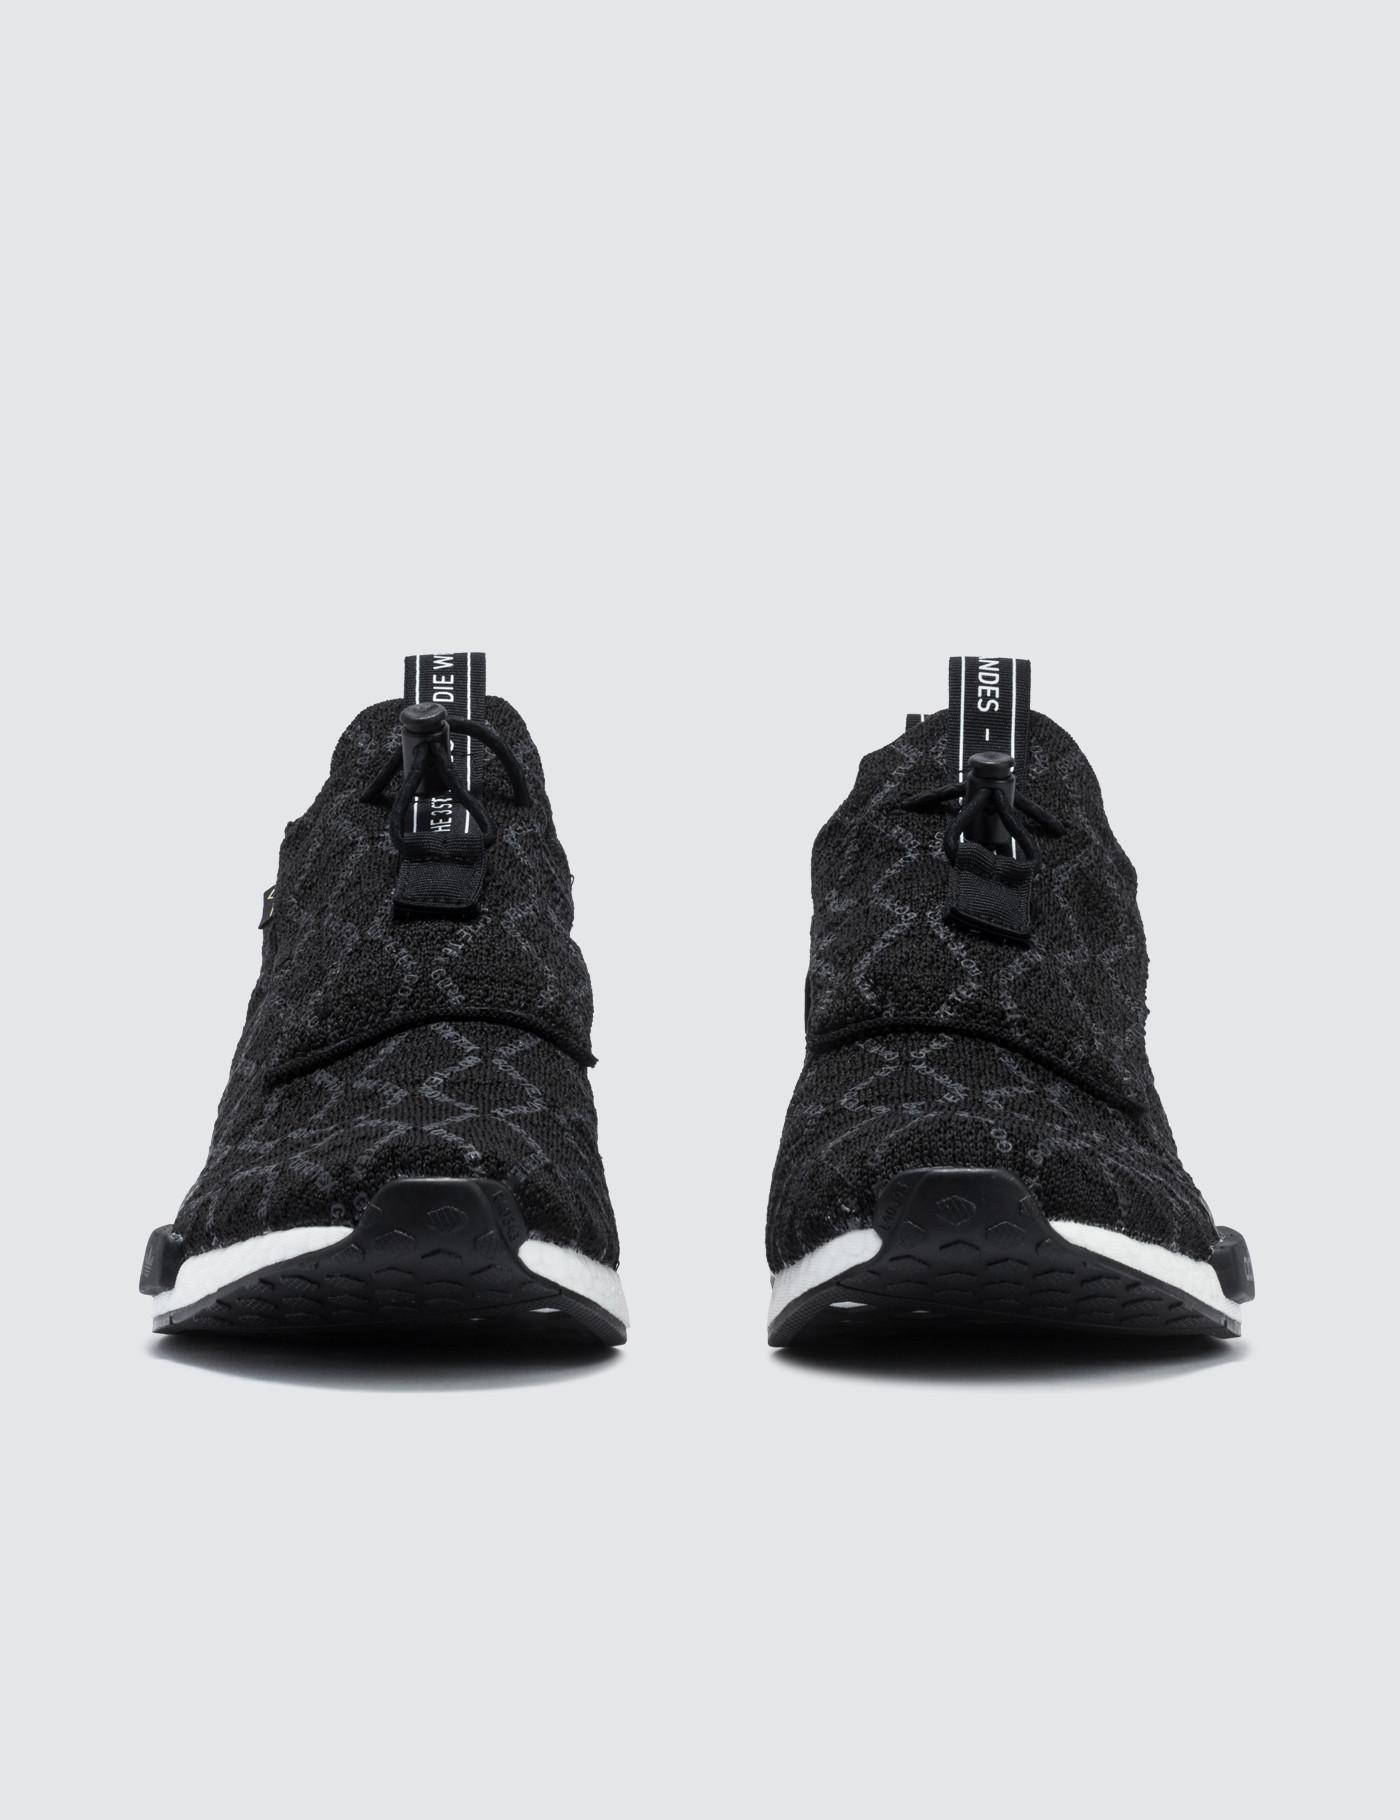 7ab2b9ebc662f0 Lyst - adidas Originals Nmd Ts1 Gtx Primeknit in Black for Men